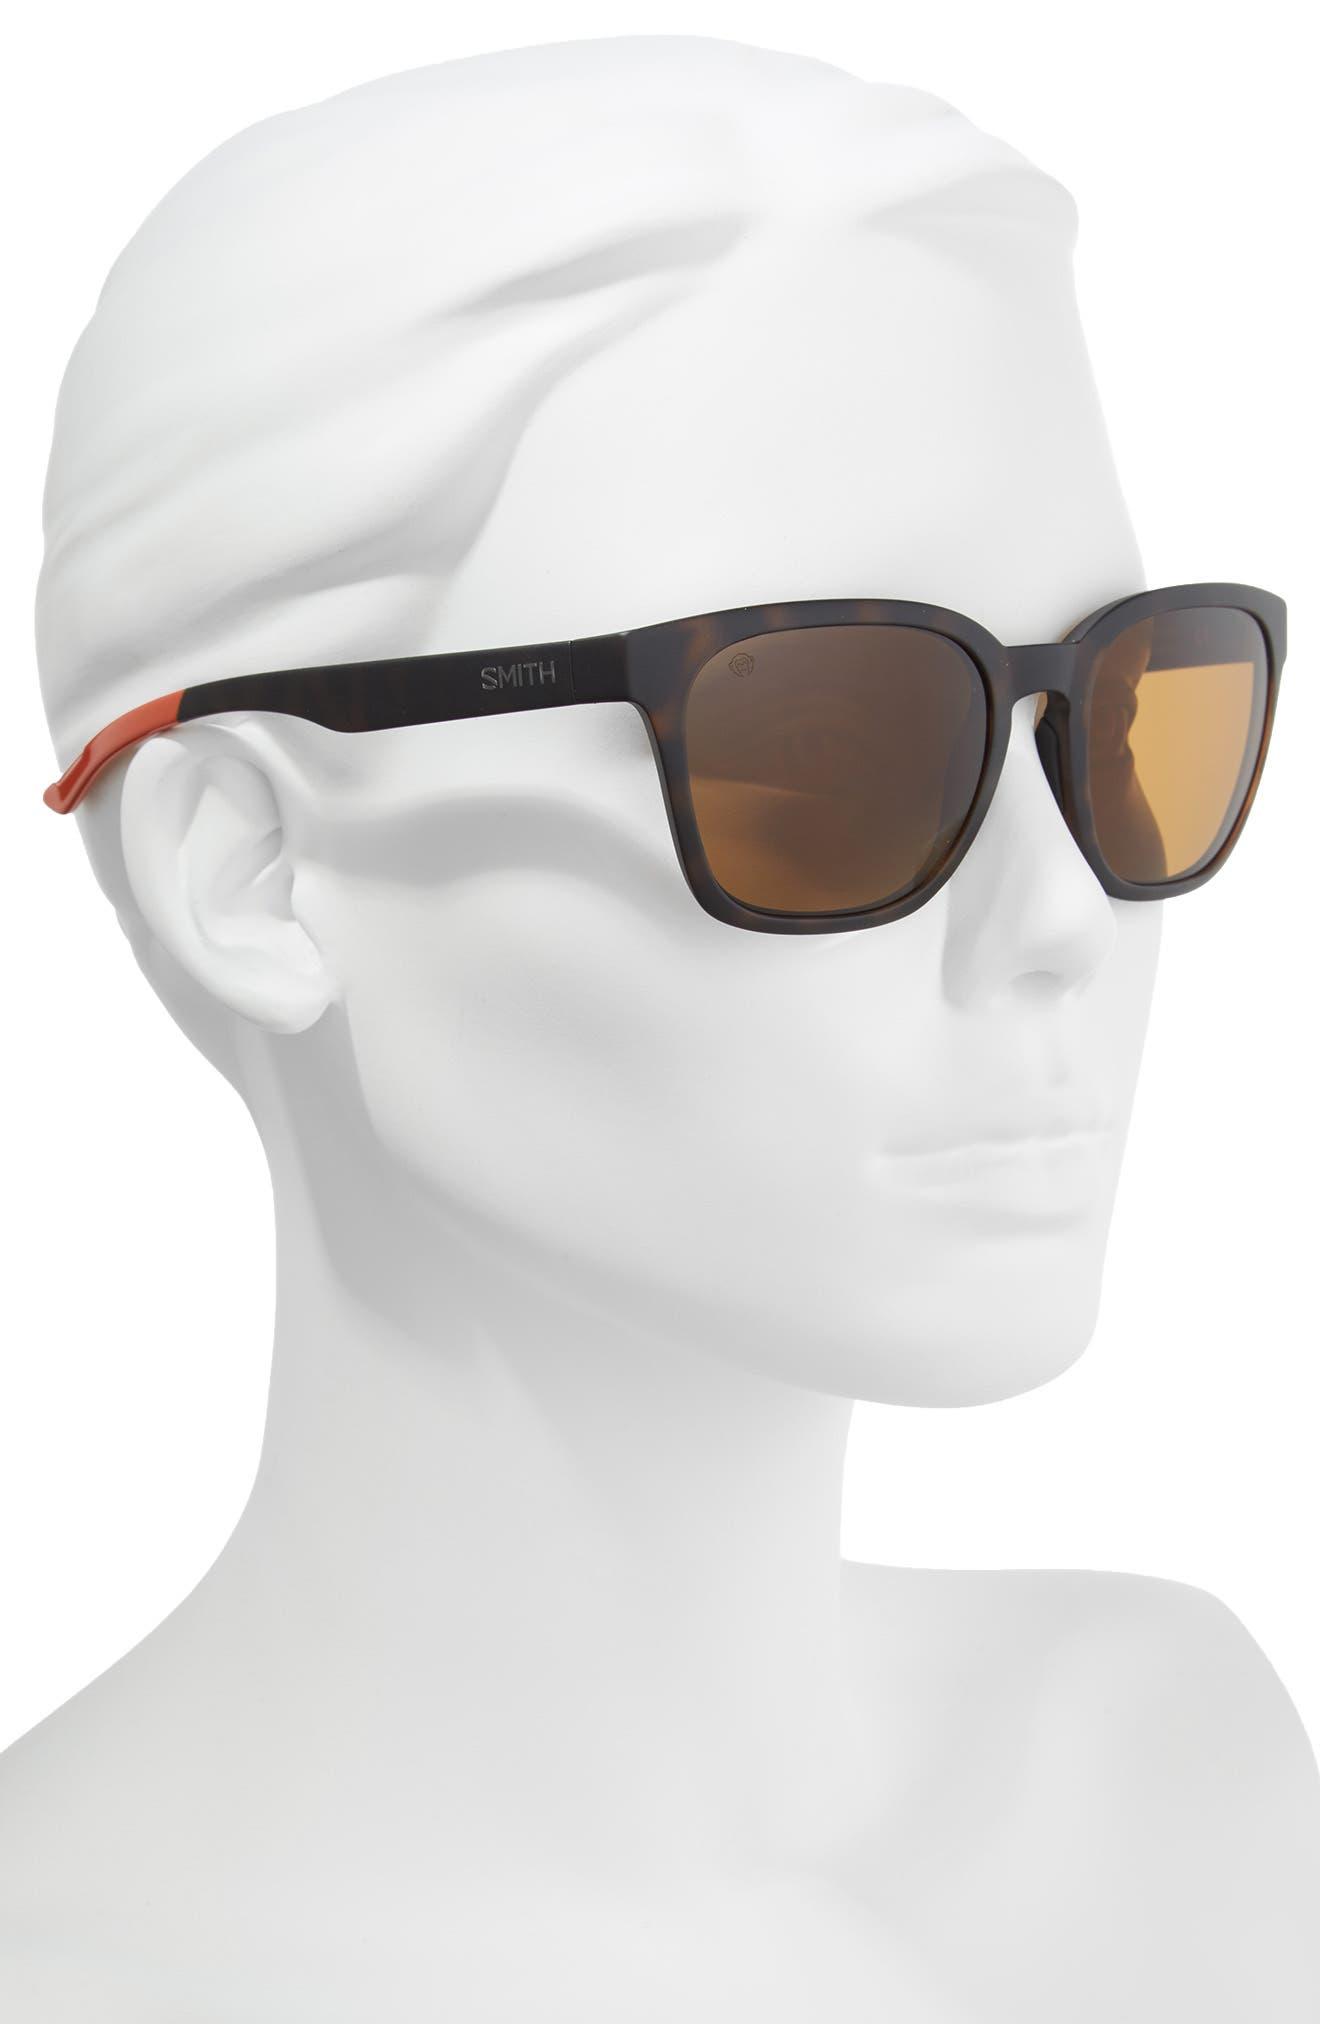 Founder 56mm ChromaPop Polarized Sunglasses,                             Alternate thumbnail 2, color,                             201